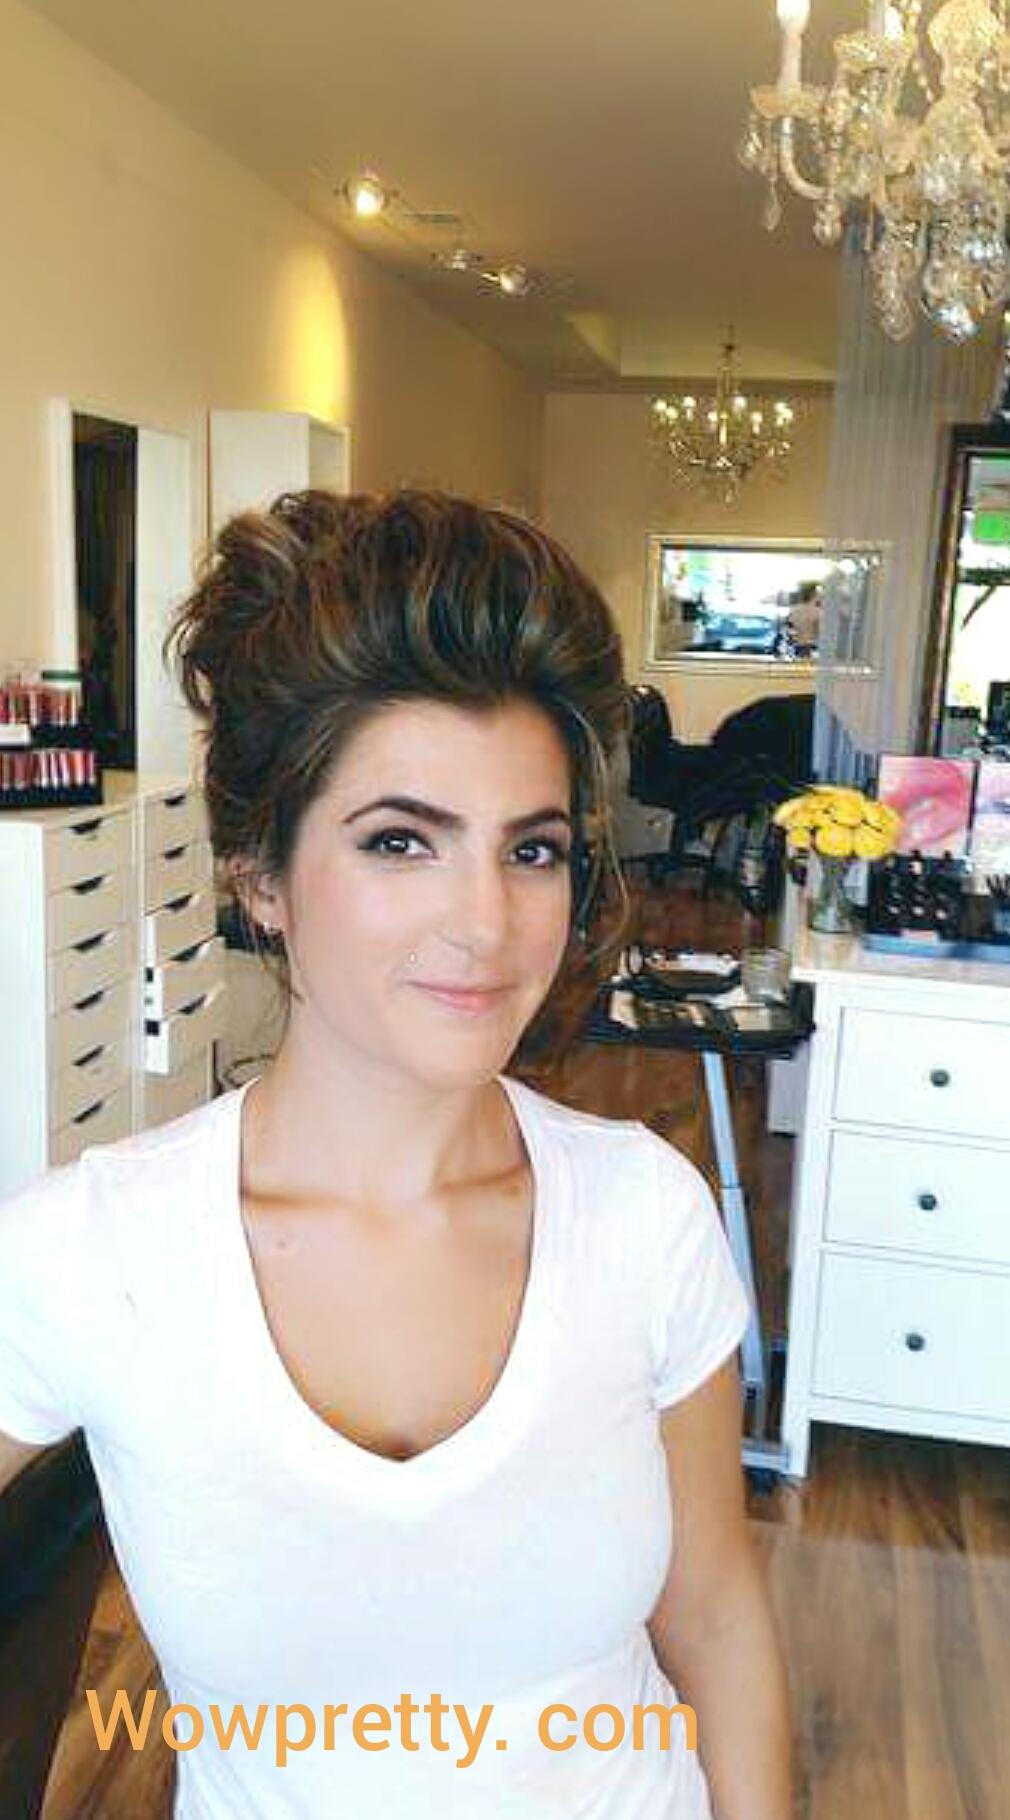 wedding-trial-makeup-and-hair_26825382522_o.jpg